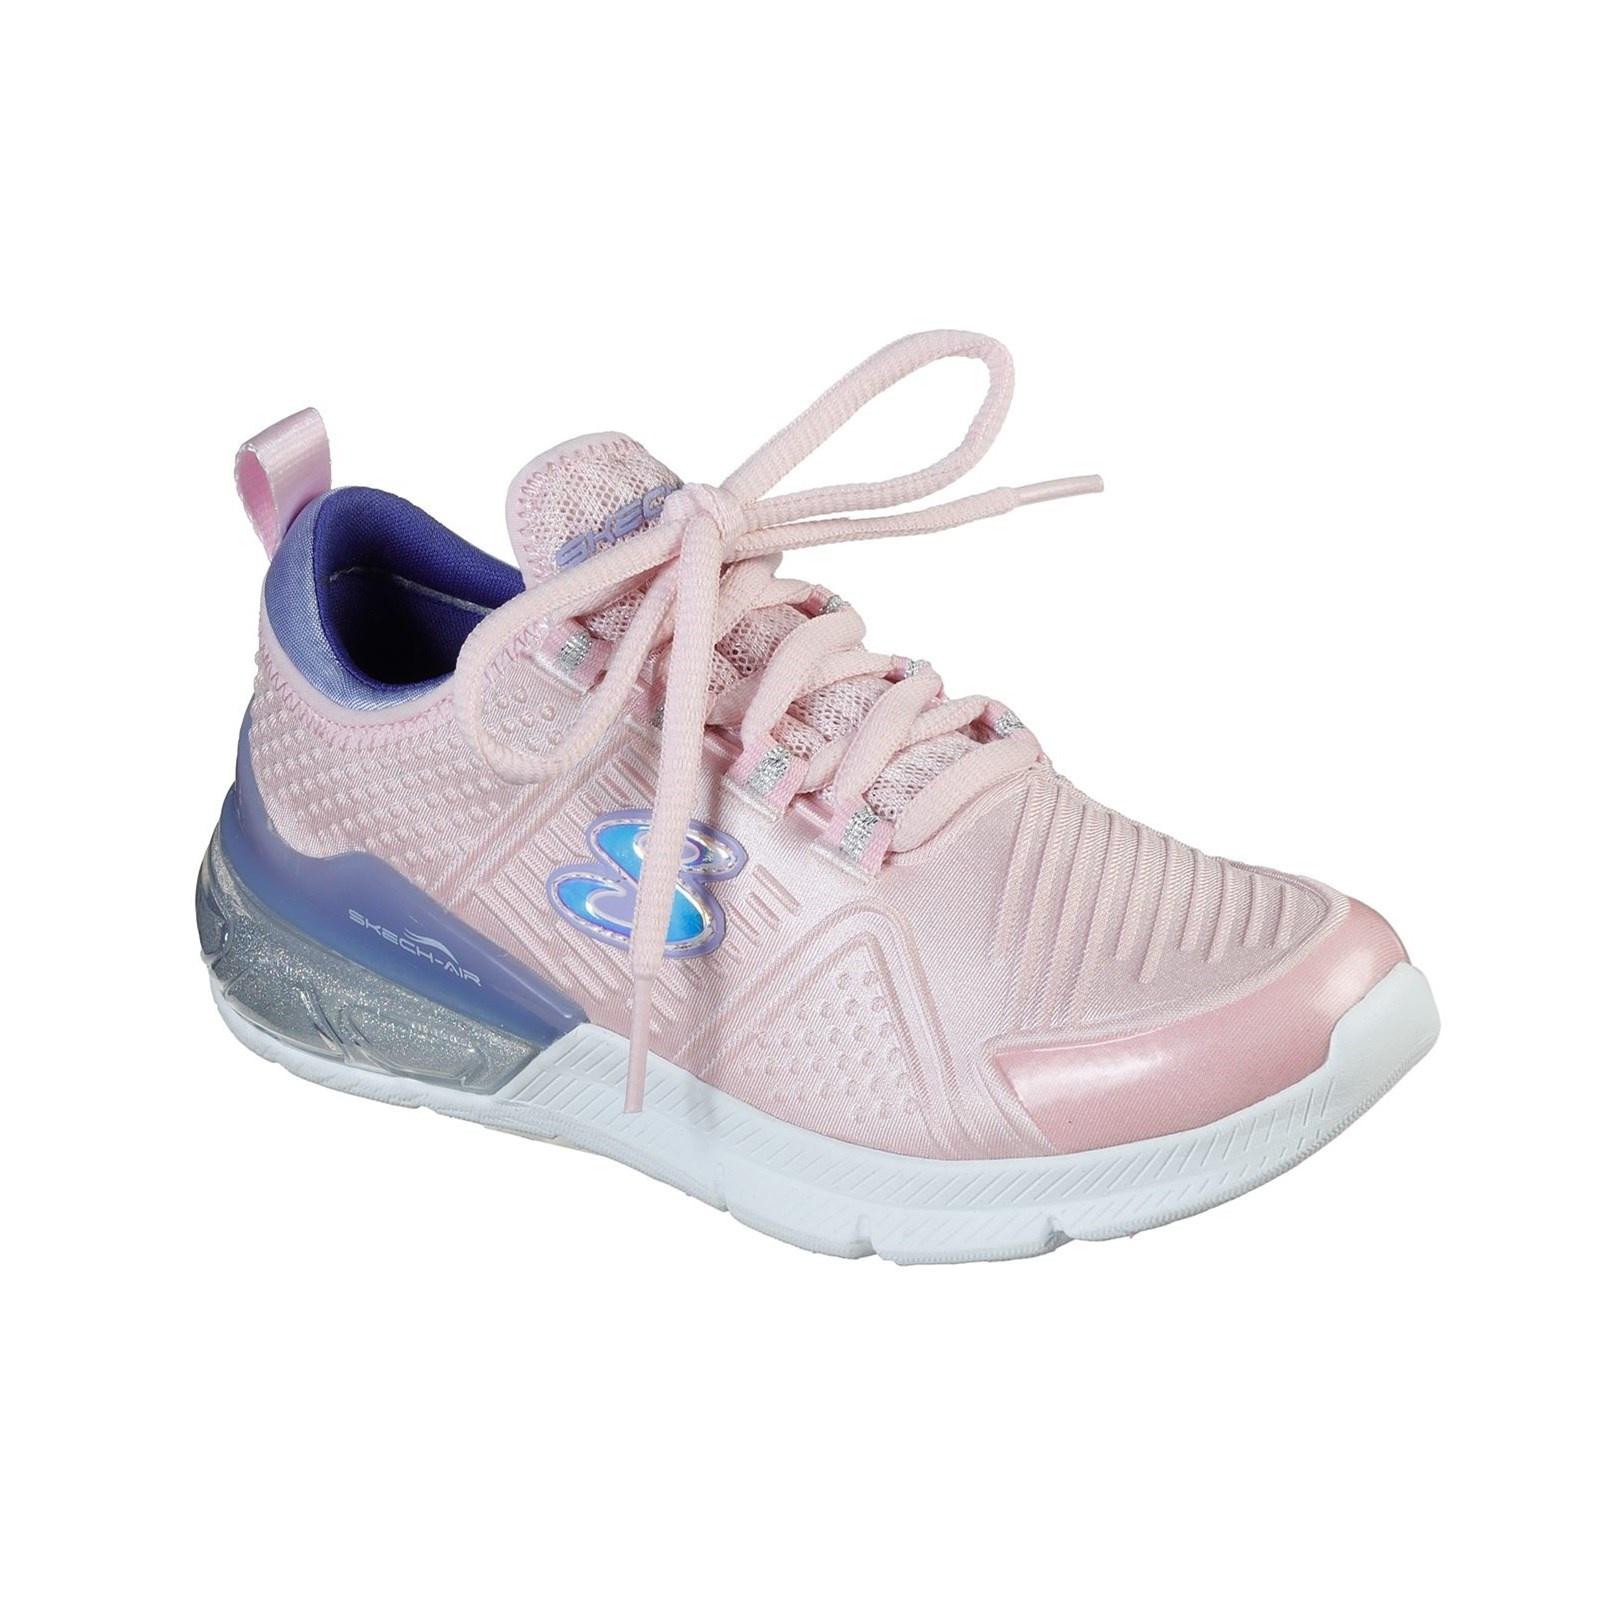 Skechers Optical Shine Pink